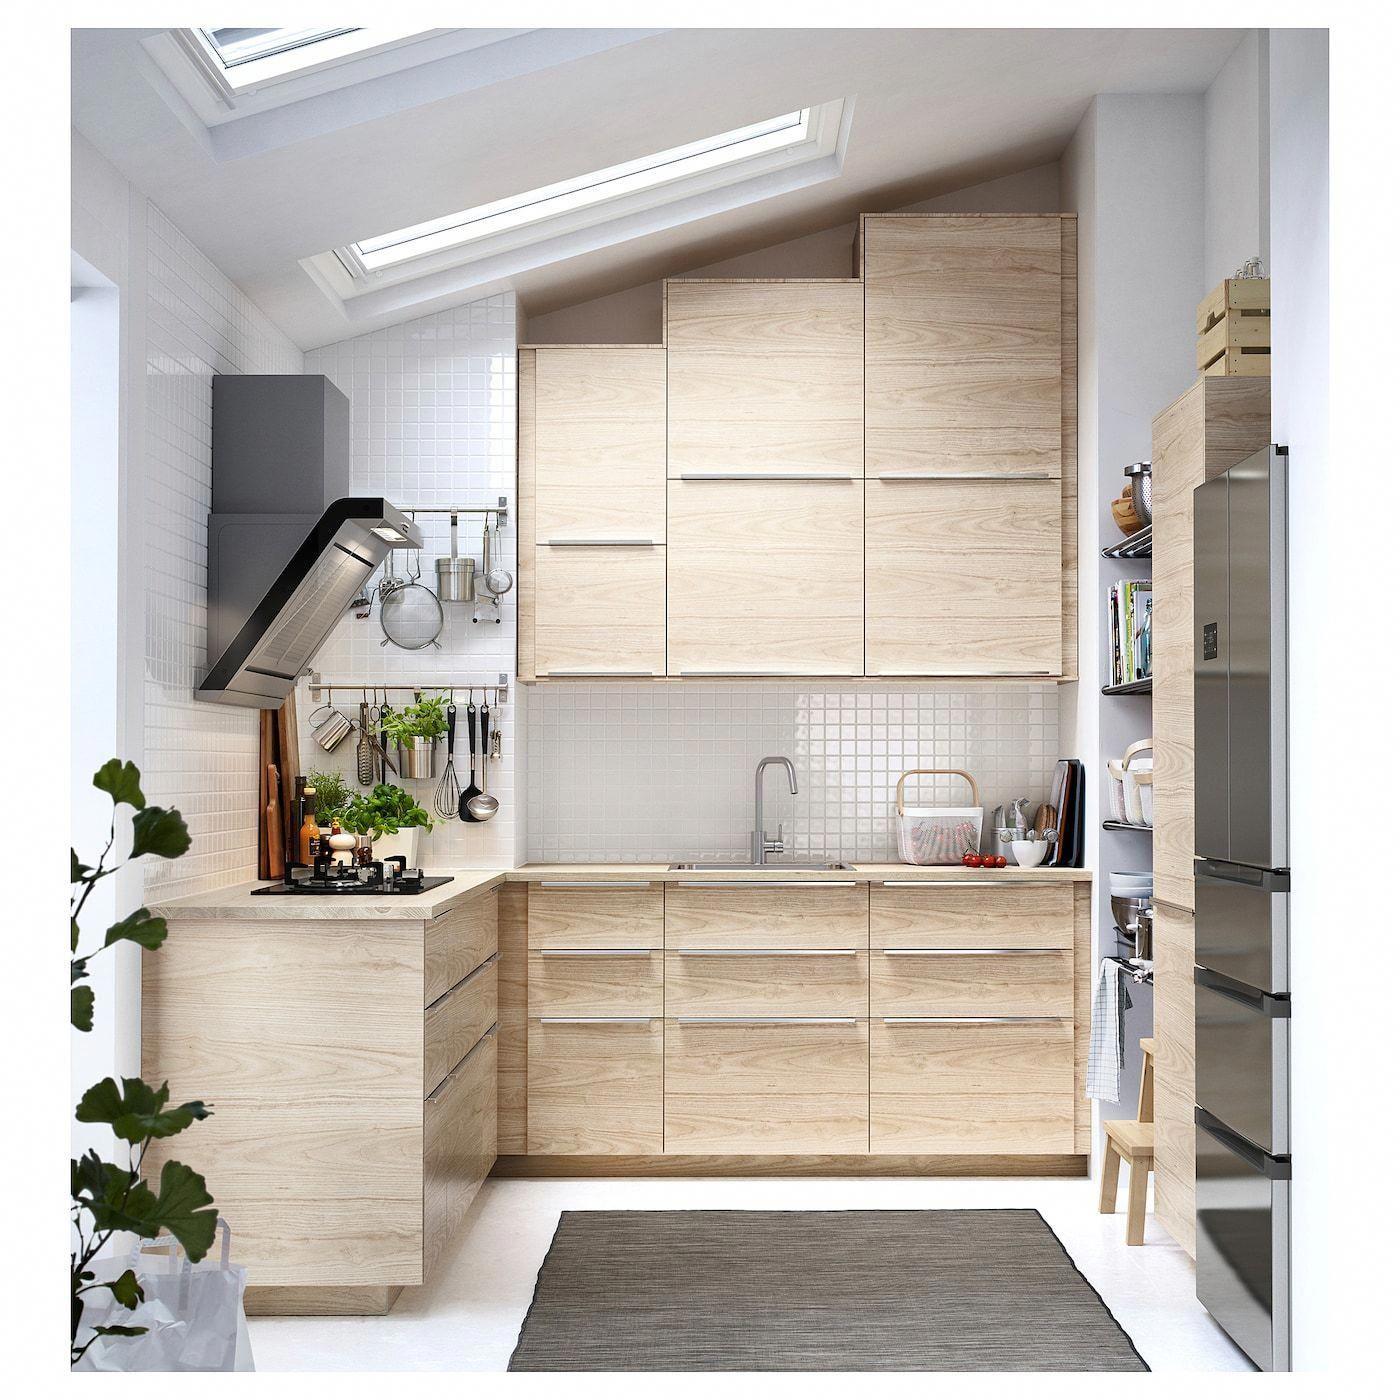 Ikea Ekbacken Countertop Ash Effect Laminate Kitchendecor